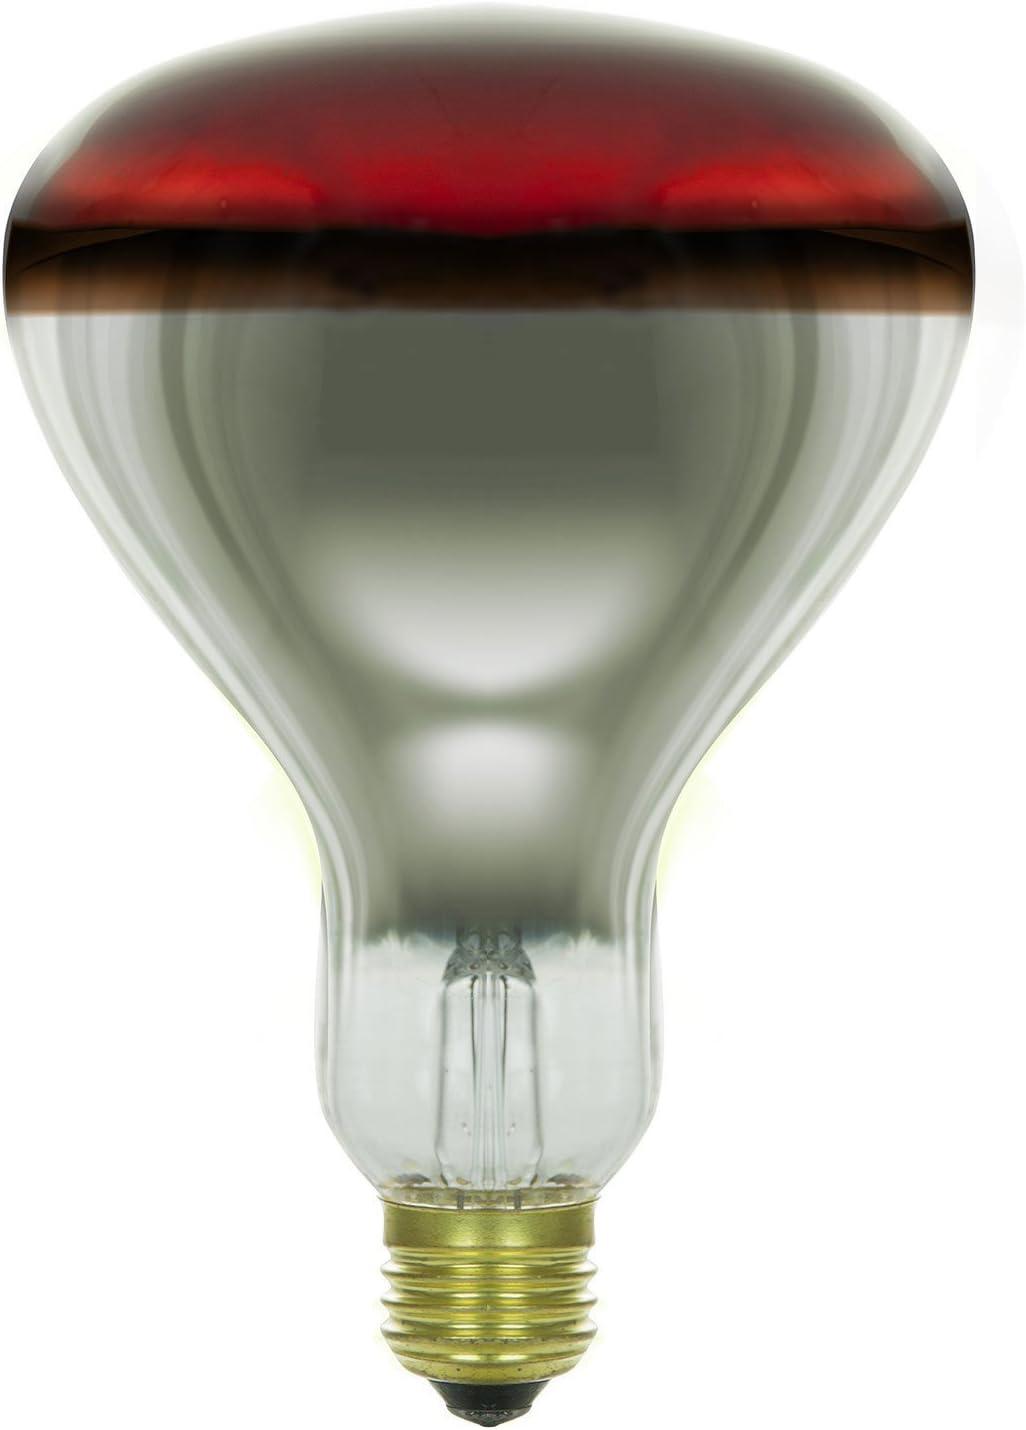 Sunlite 250 Watt Heat Lamp Infrared R40 130 Volt Tuff Skin